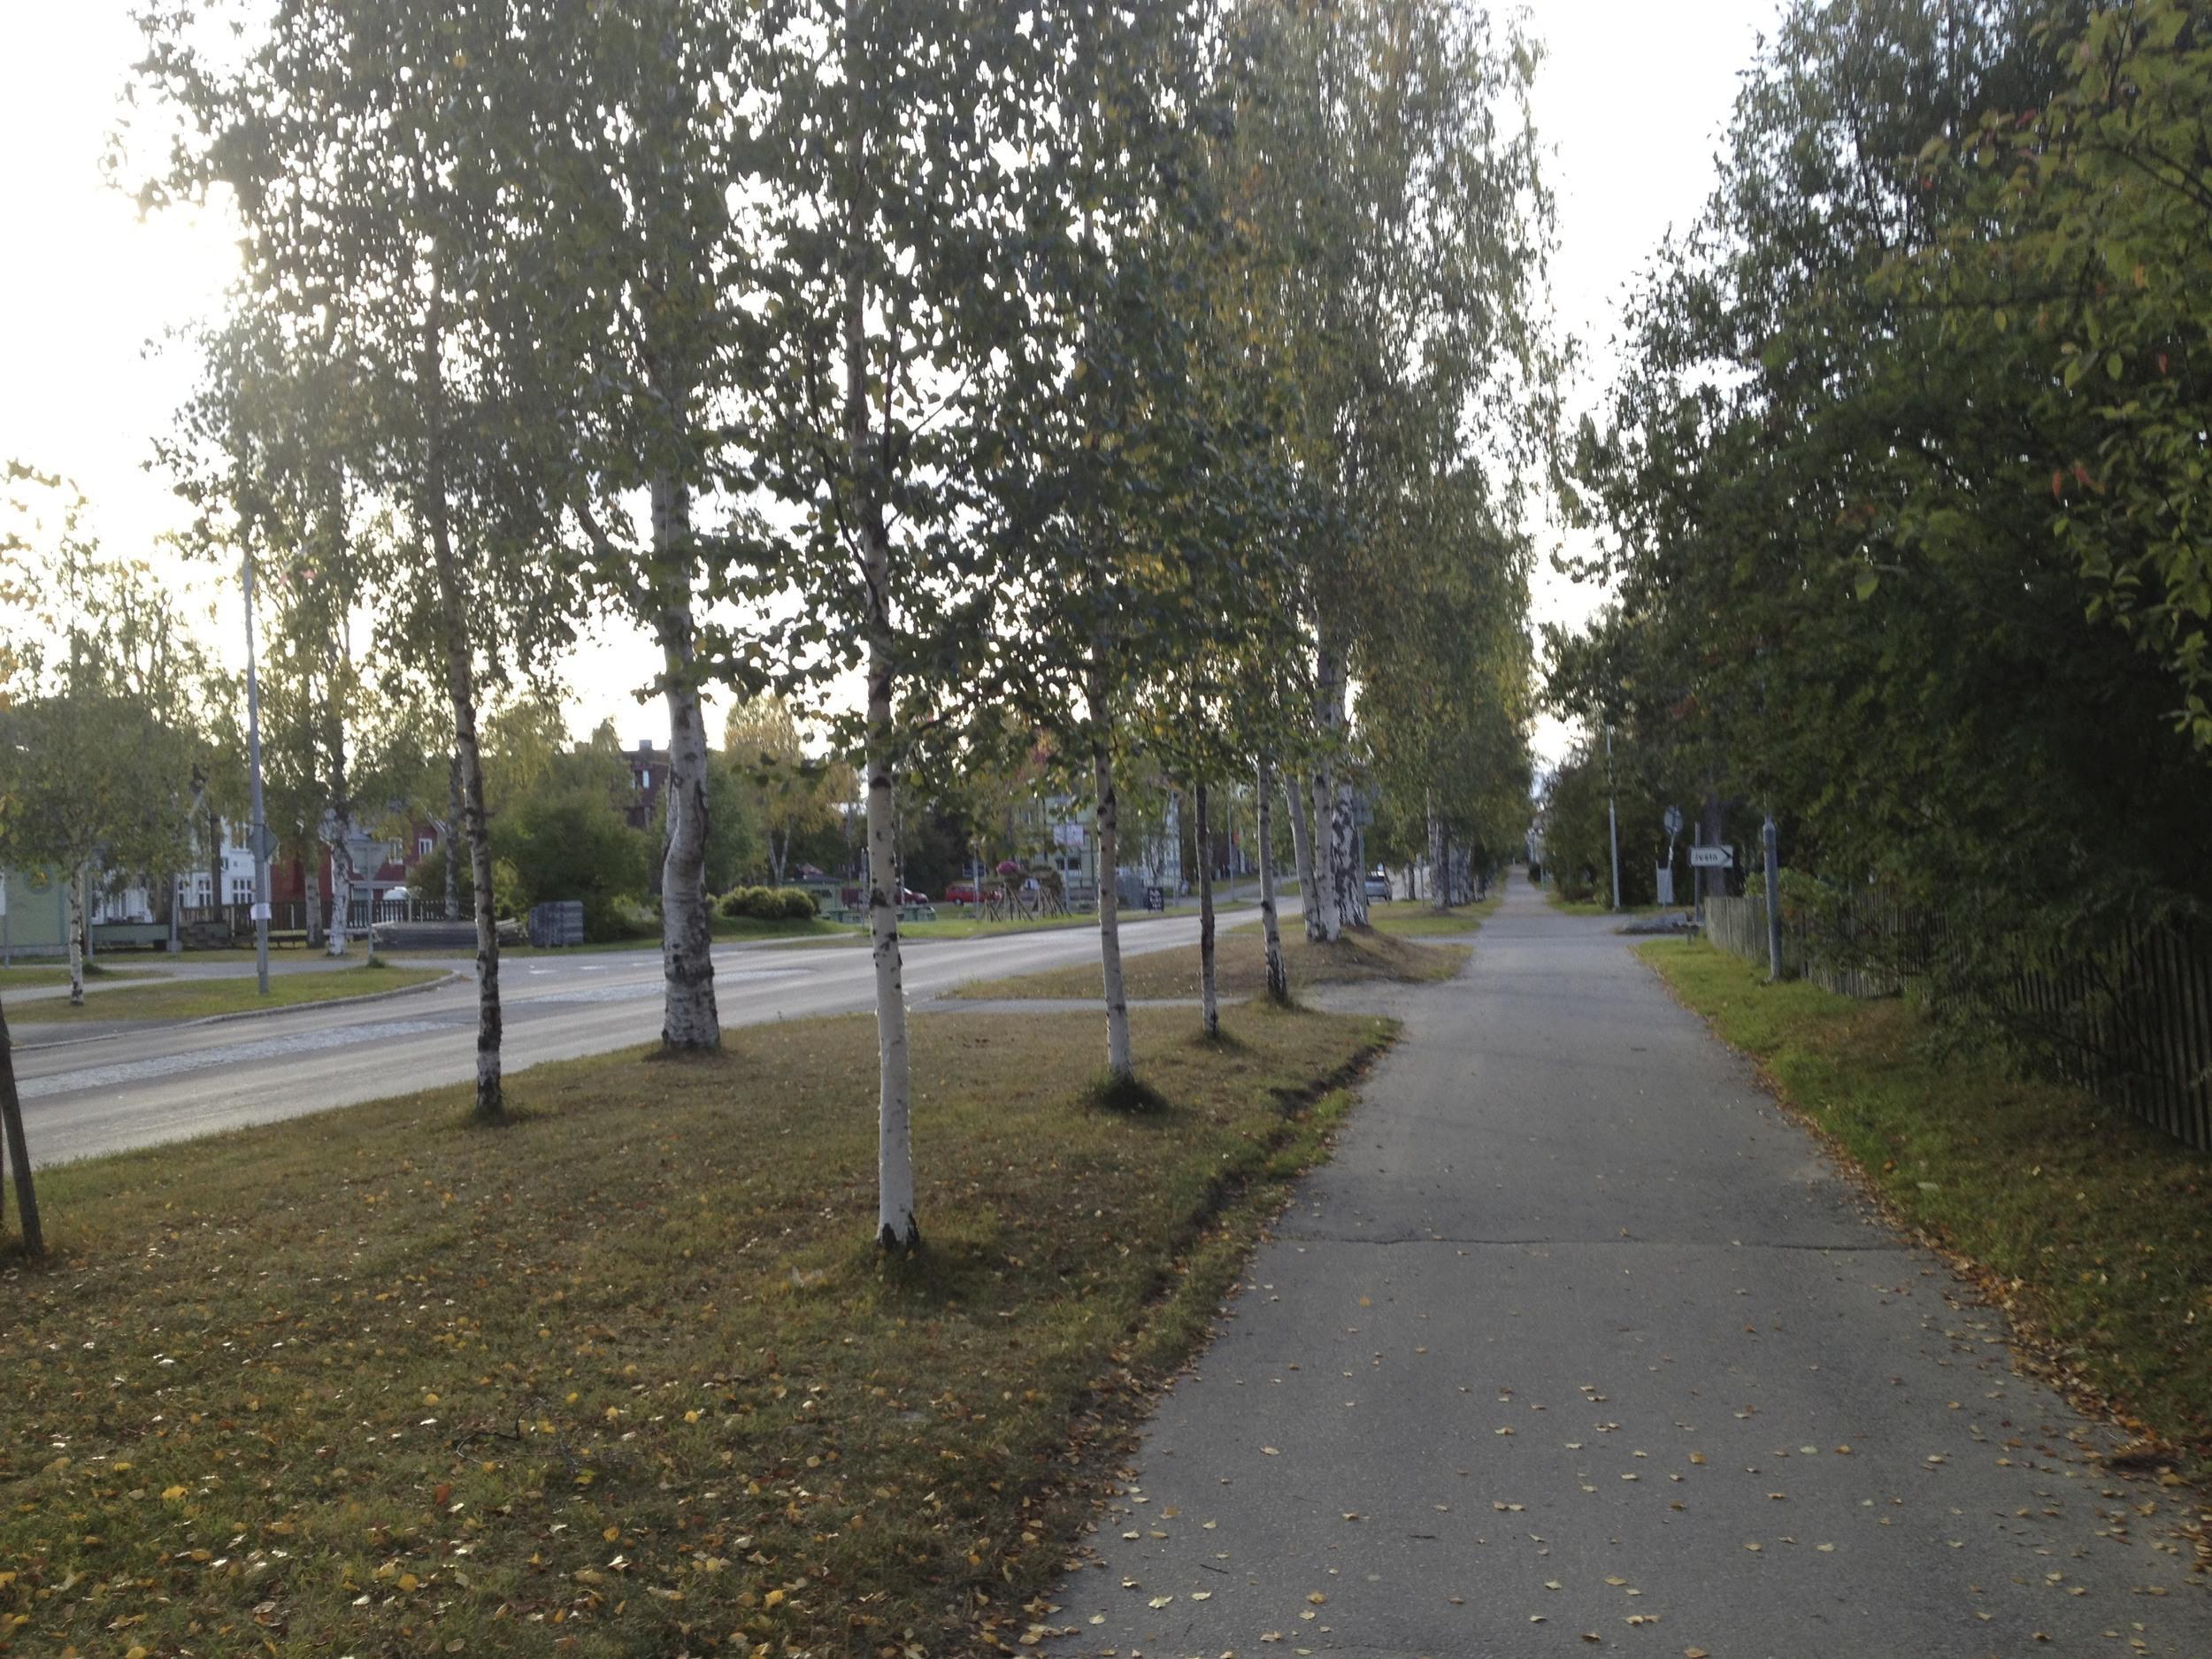 the walkway on the mainstreet of Jokkmokk